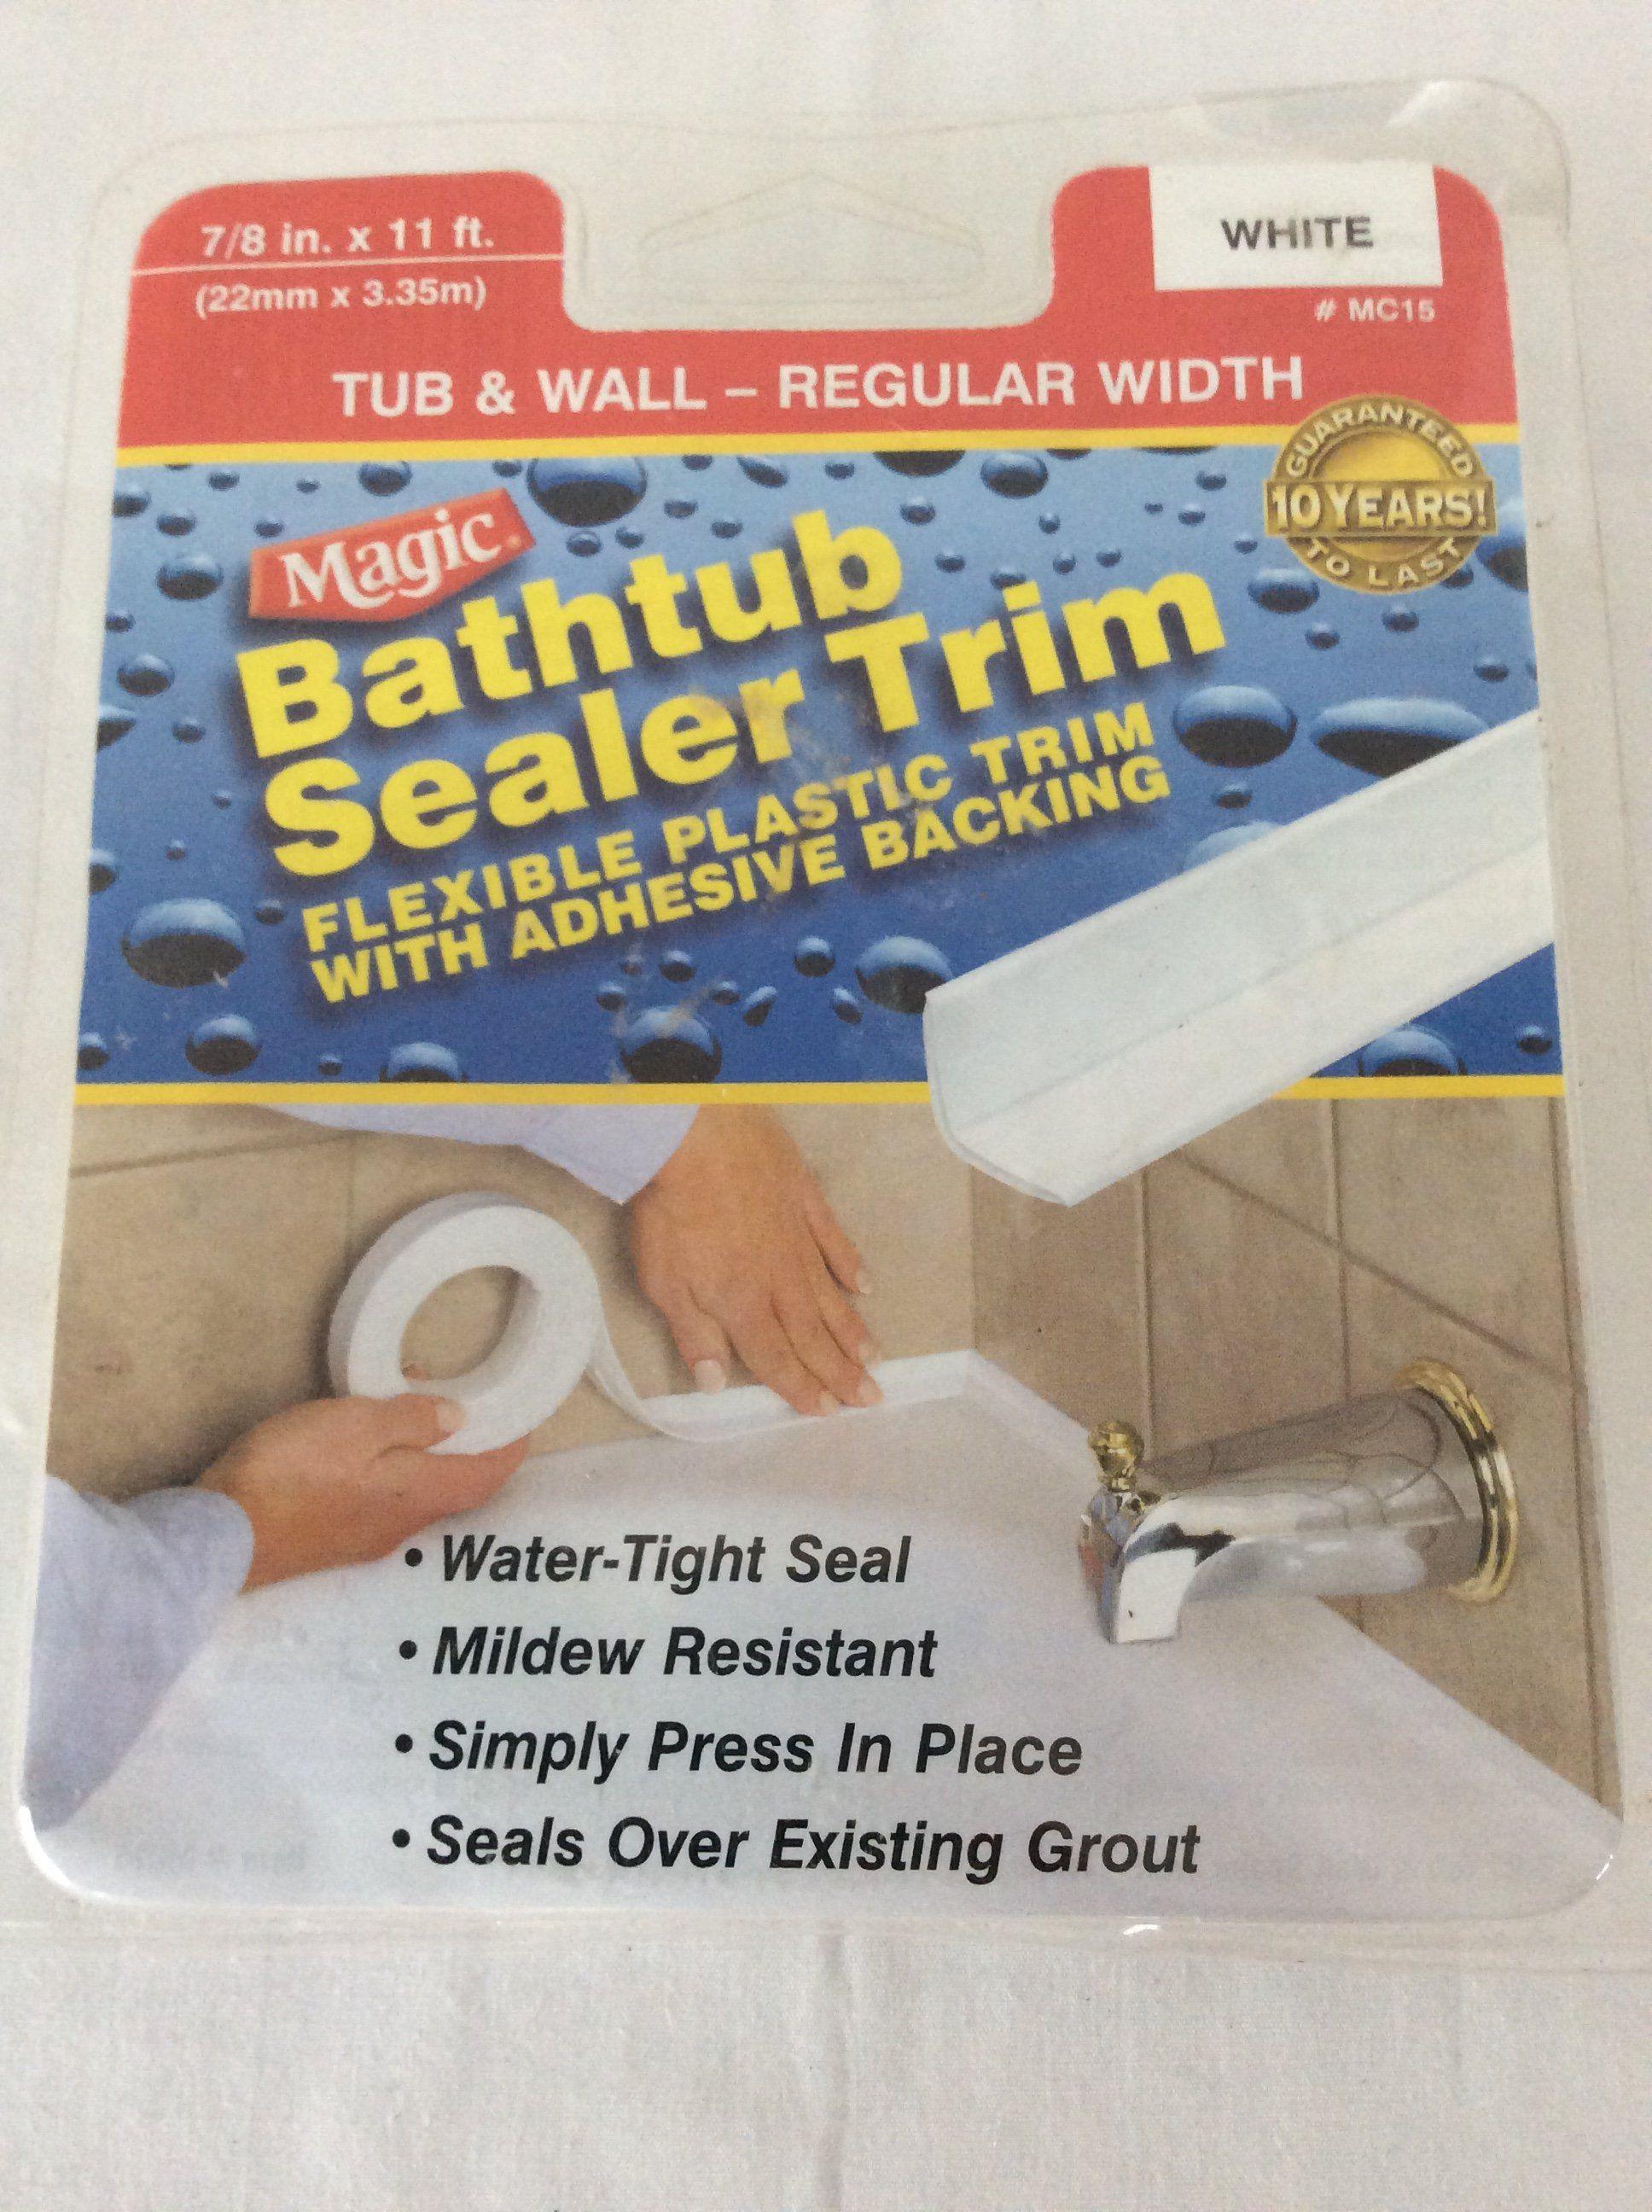 Magic Bathtub Sealer Trim Tub Amp Wall 7 8 Quot X 11 Ft